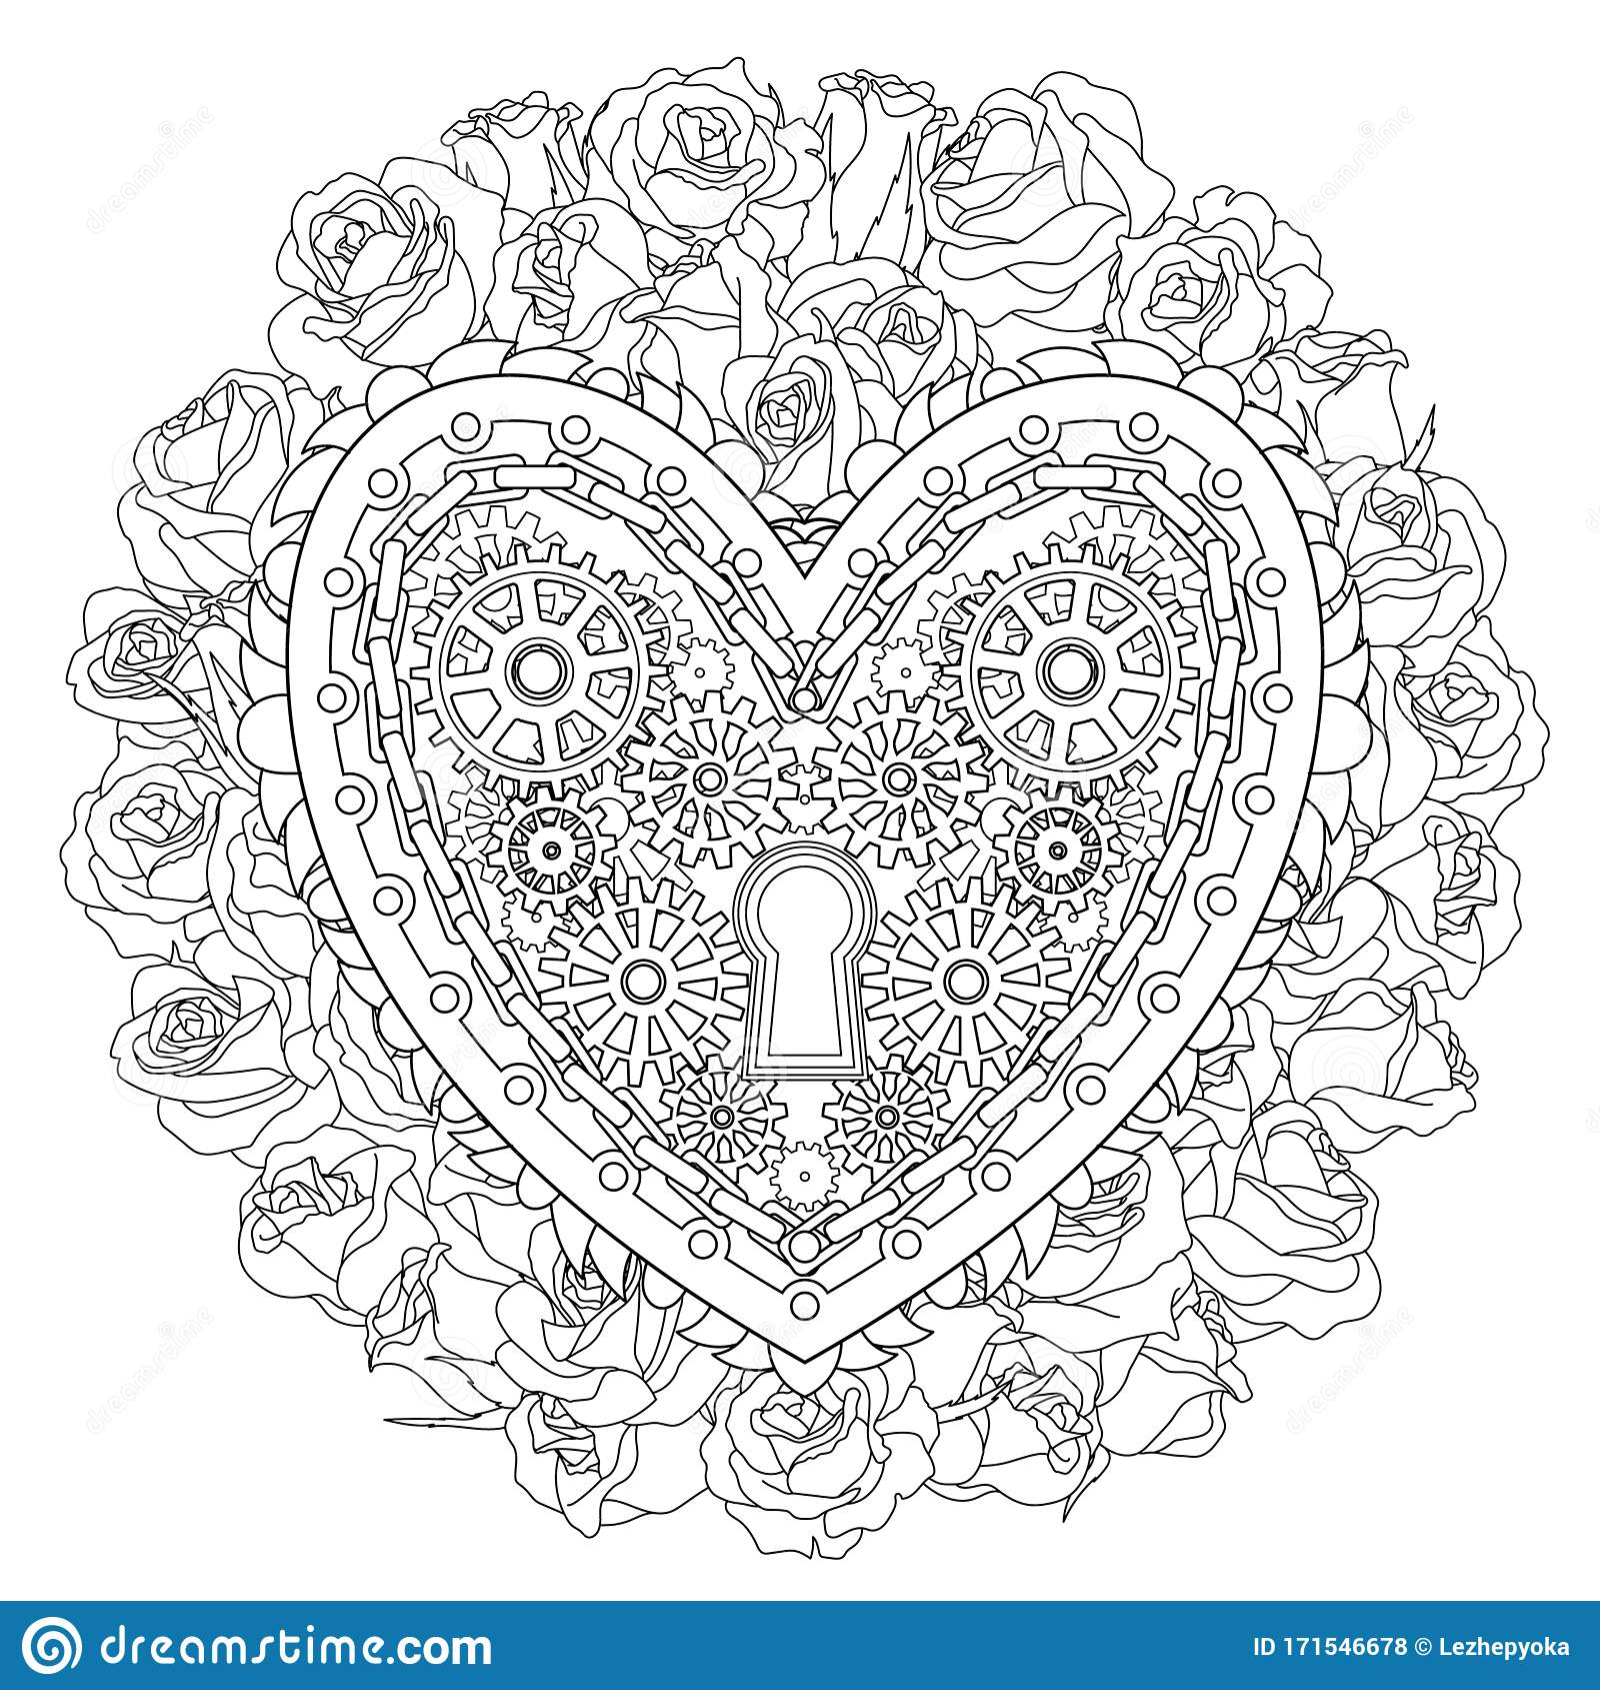 Beautiful Heart Coloring Book Stock Illustrations 1 350 Beautiful Heart Coloring Book Stock Illustrations Vectors Clipart Dreamstime